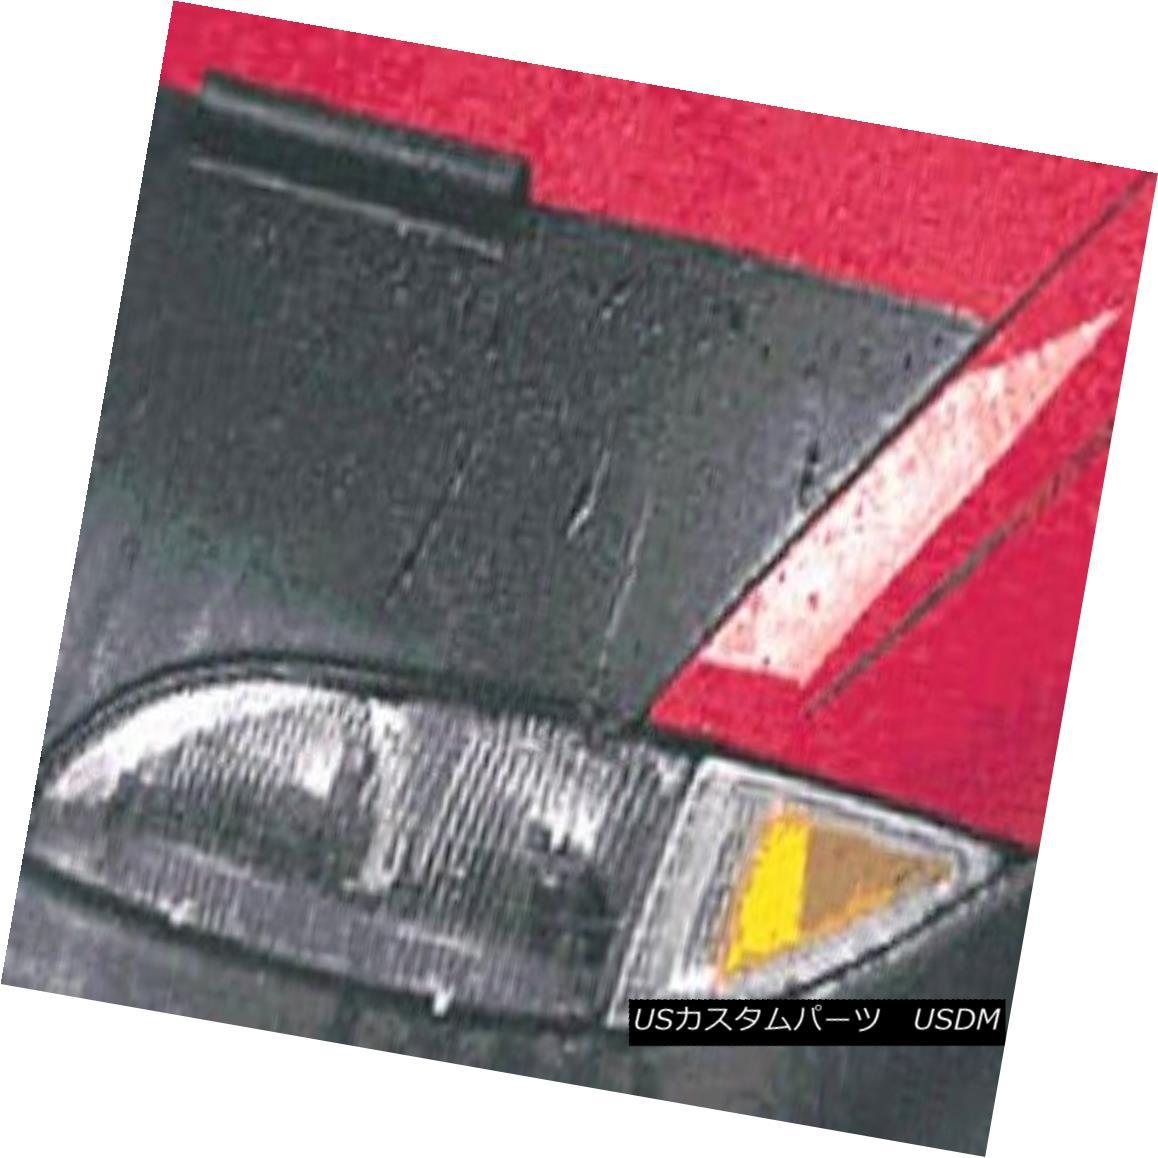 FORD,TAURUS Lebra 2 piece Front End Cover Black 1992 thru 1995 Fits Car Mask Bra